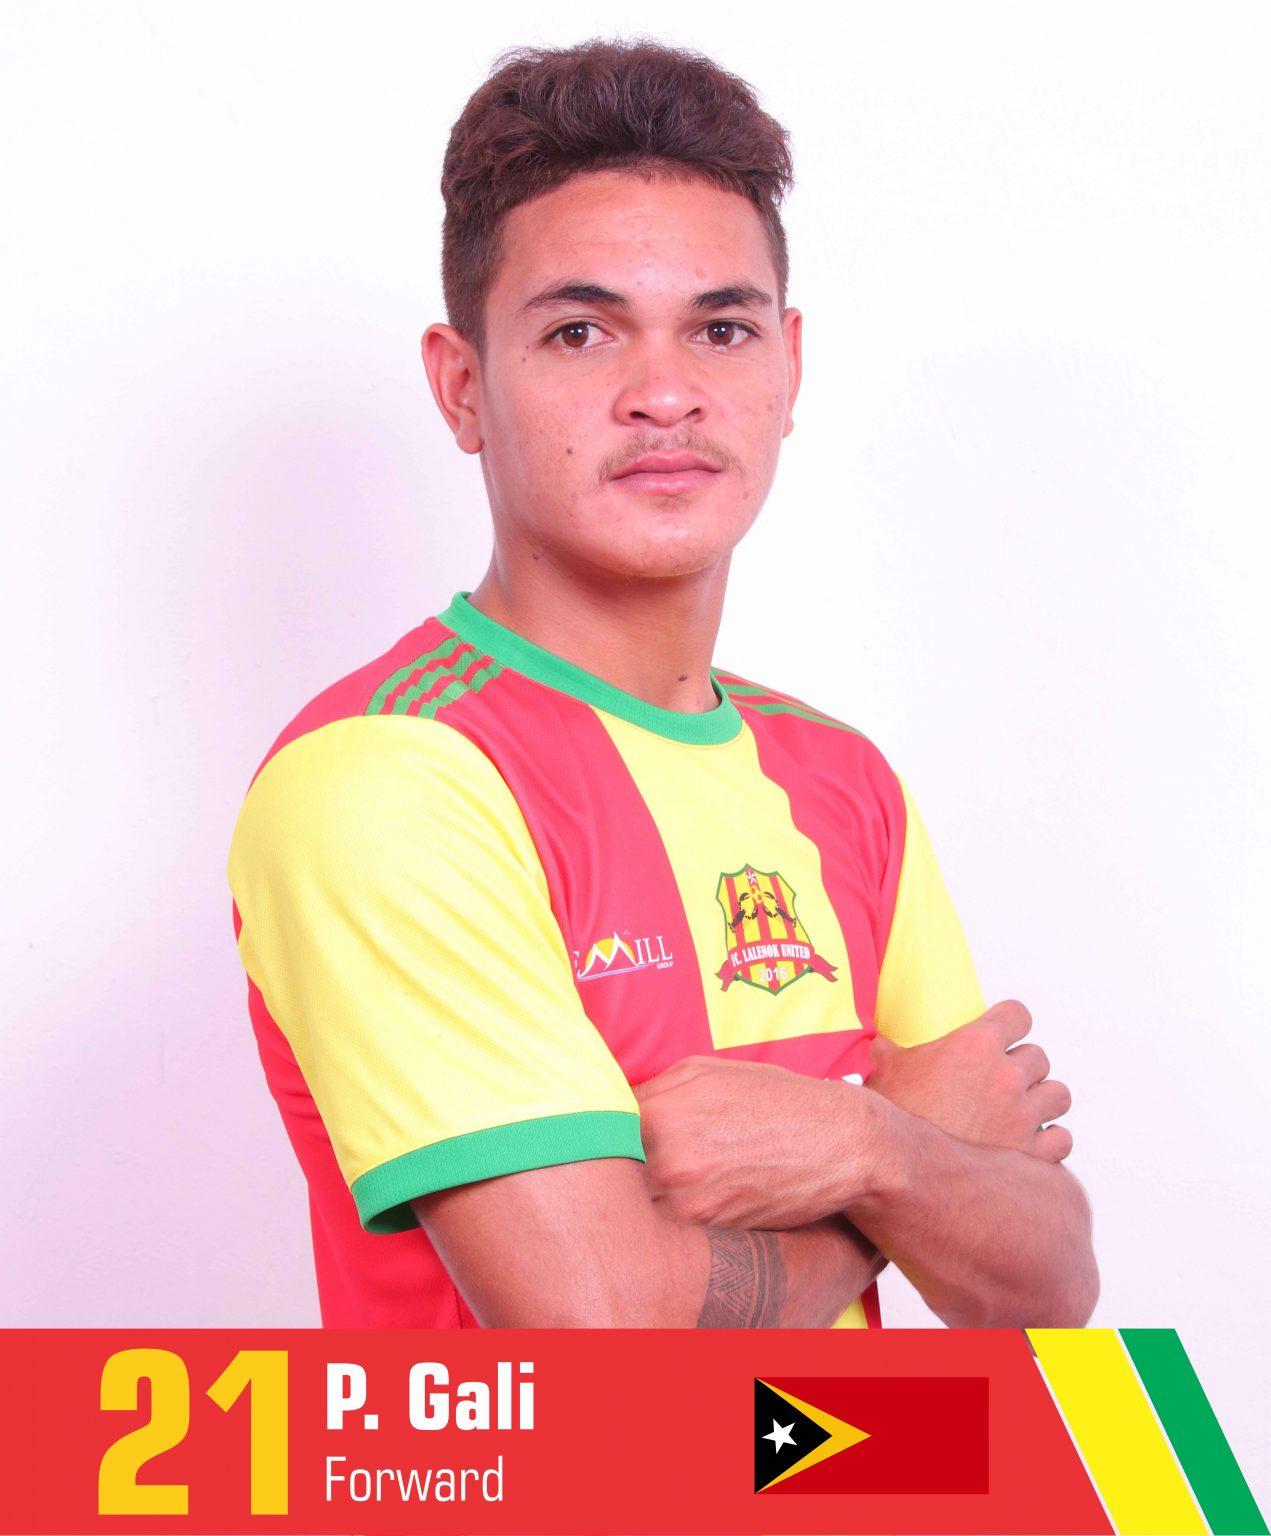 Paulo Gali